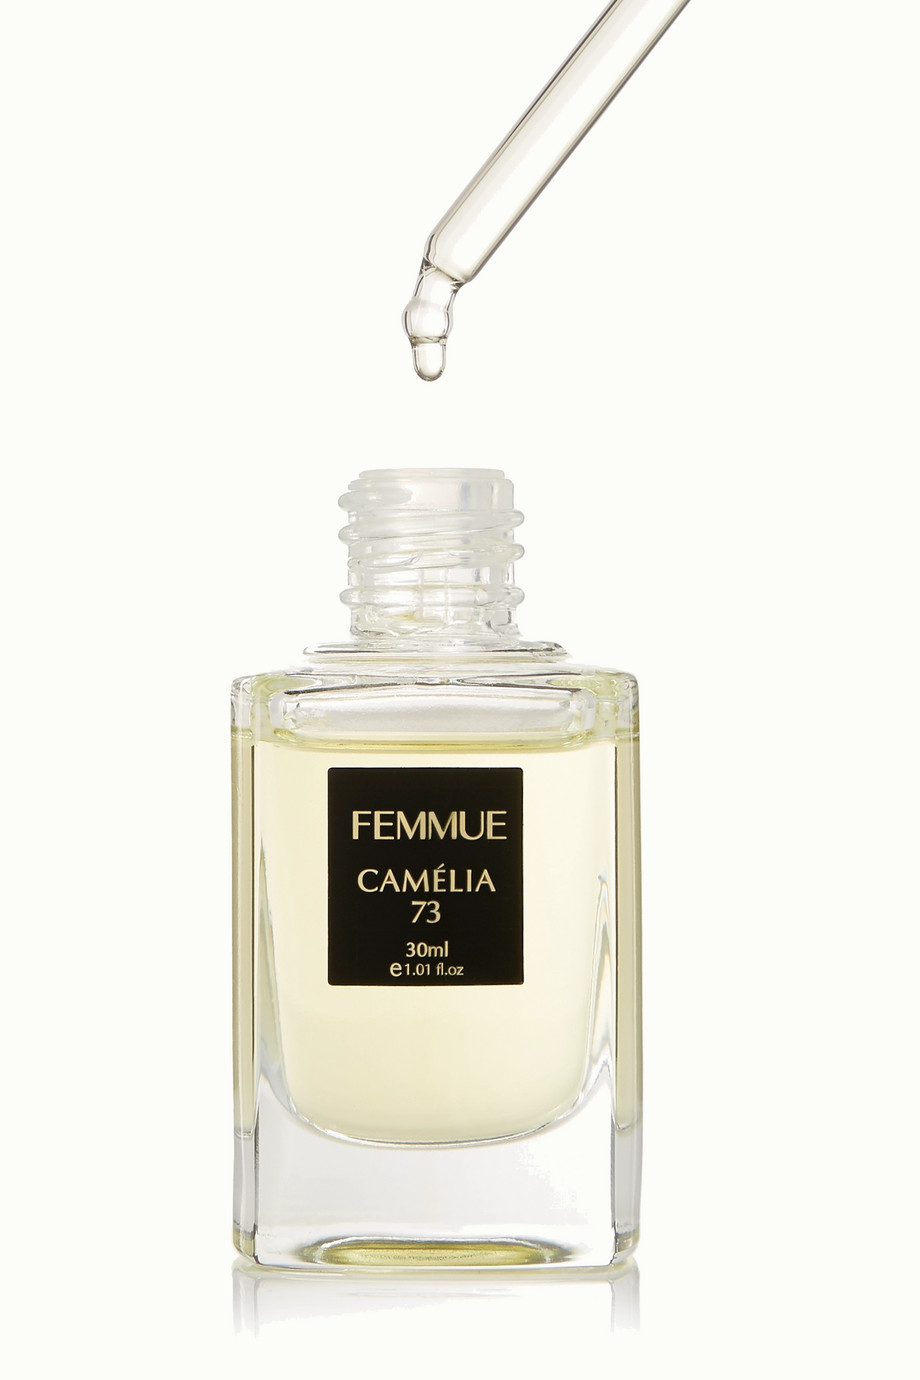 FEMMUE Camélia 73 Face Oil, 30ml